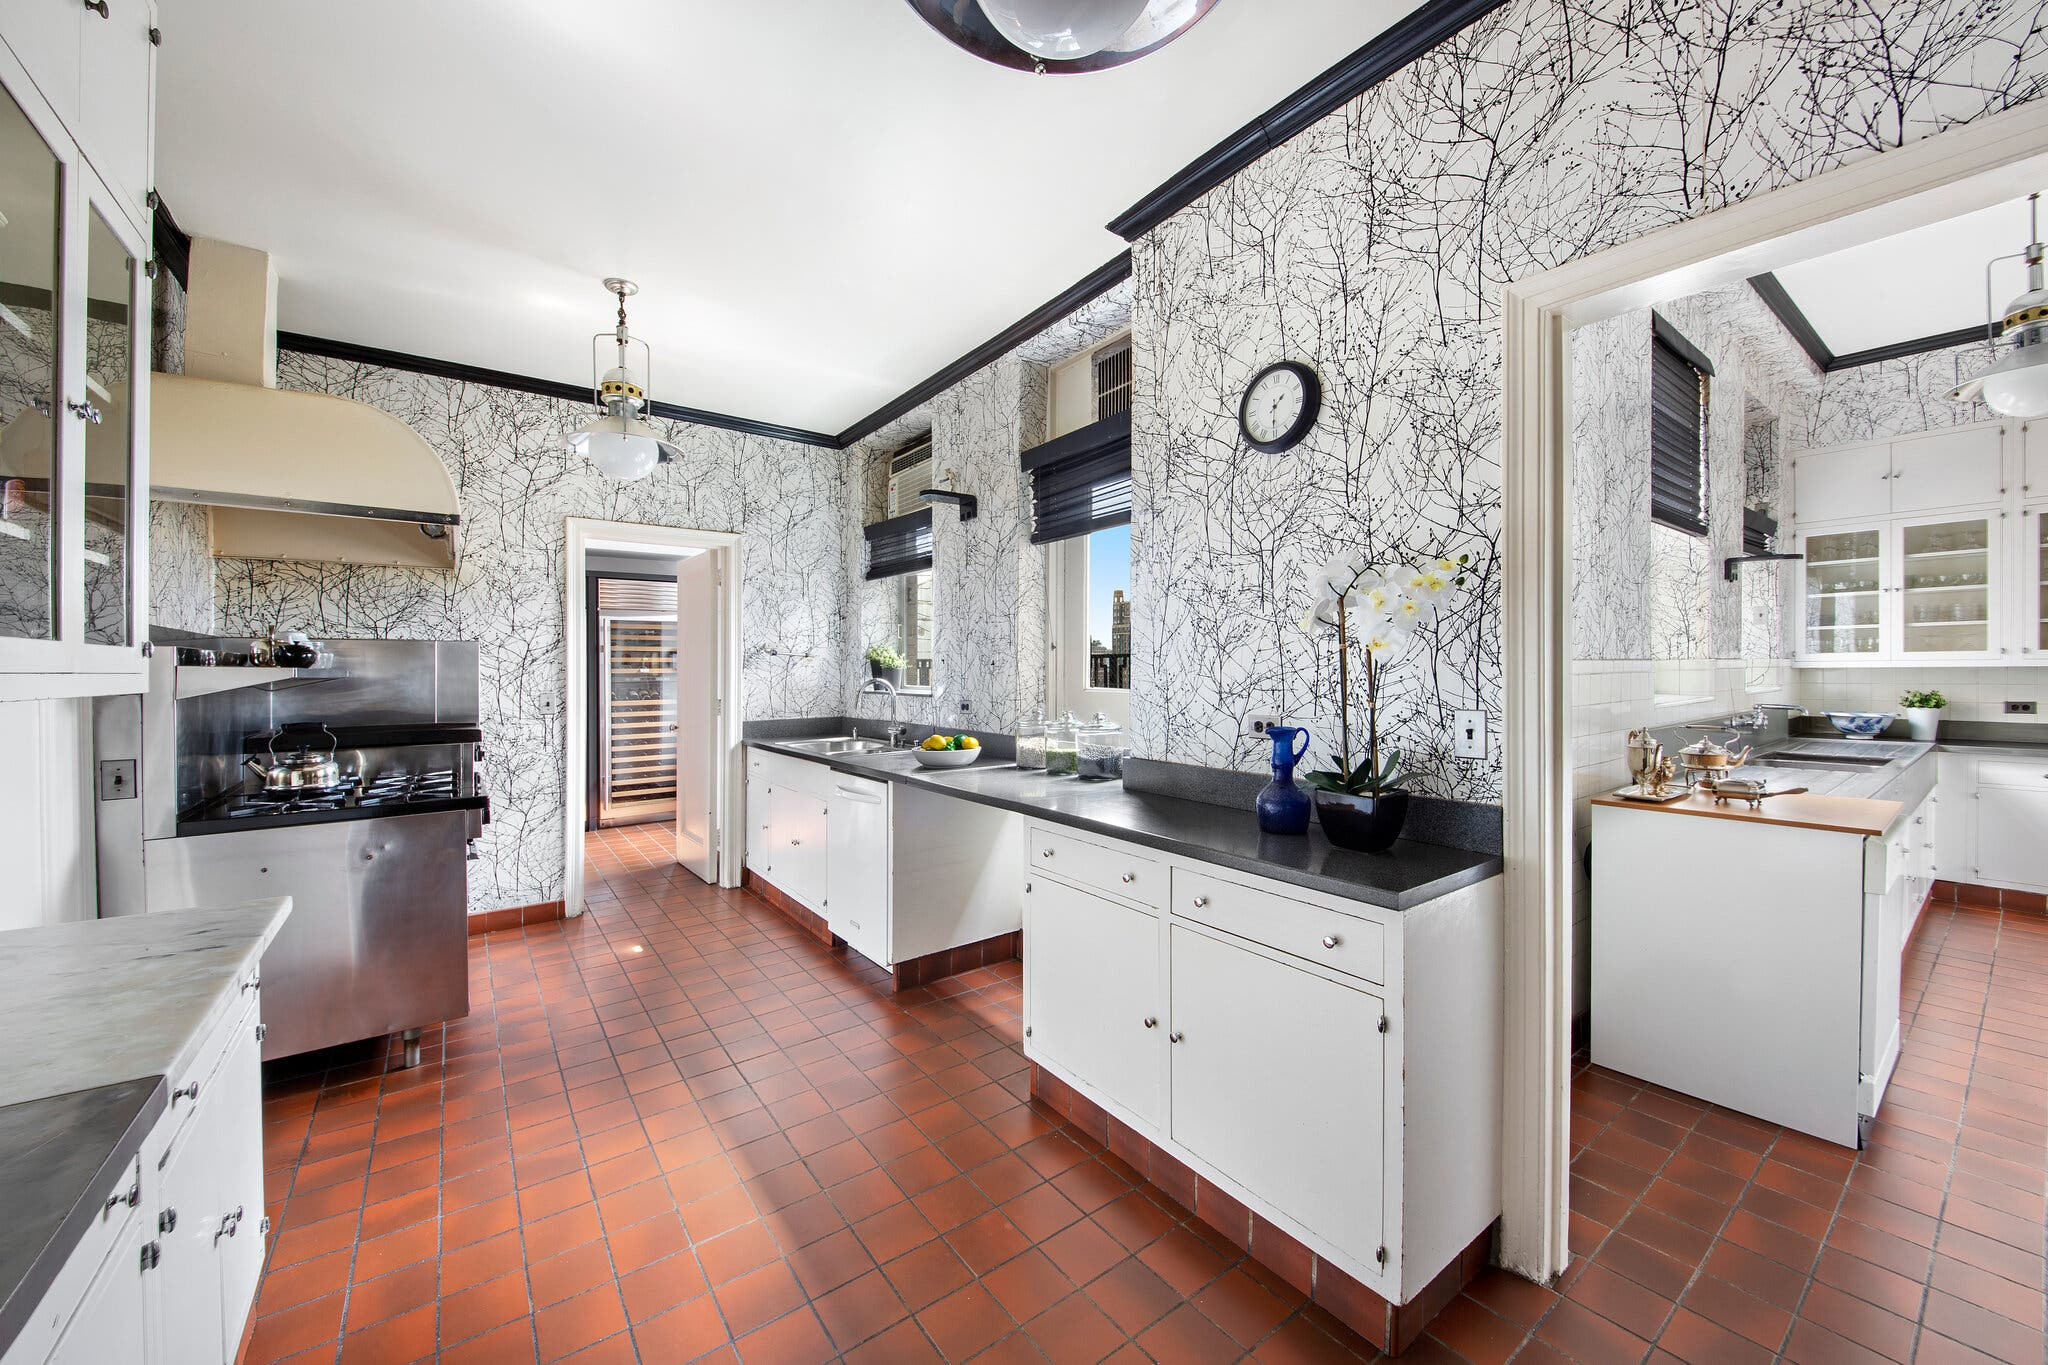 Cocina / Warburg Realty